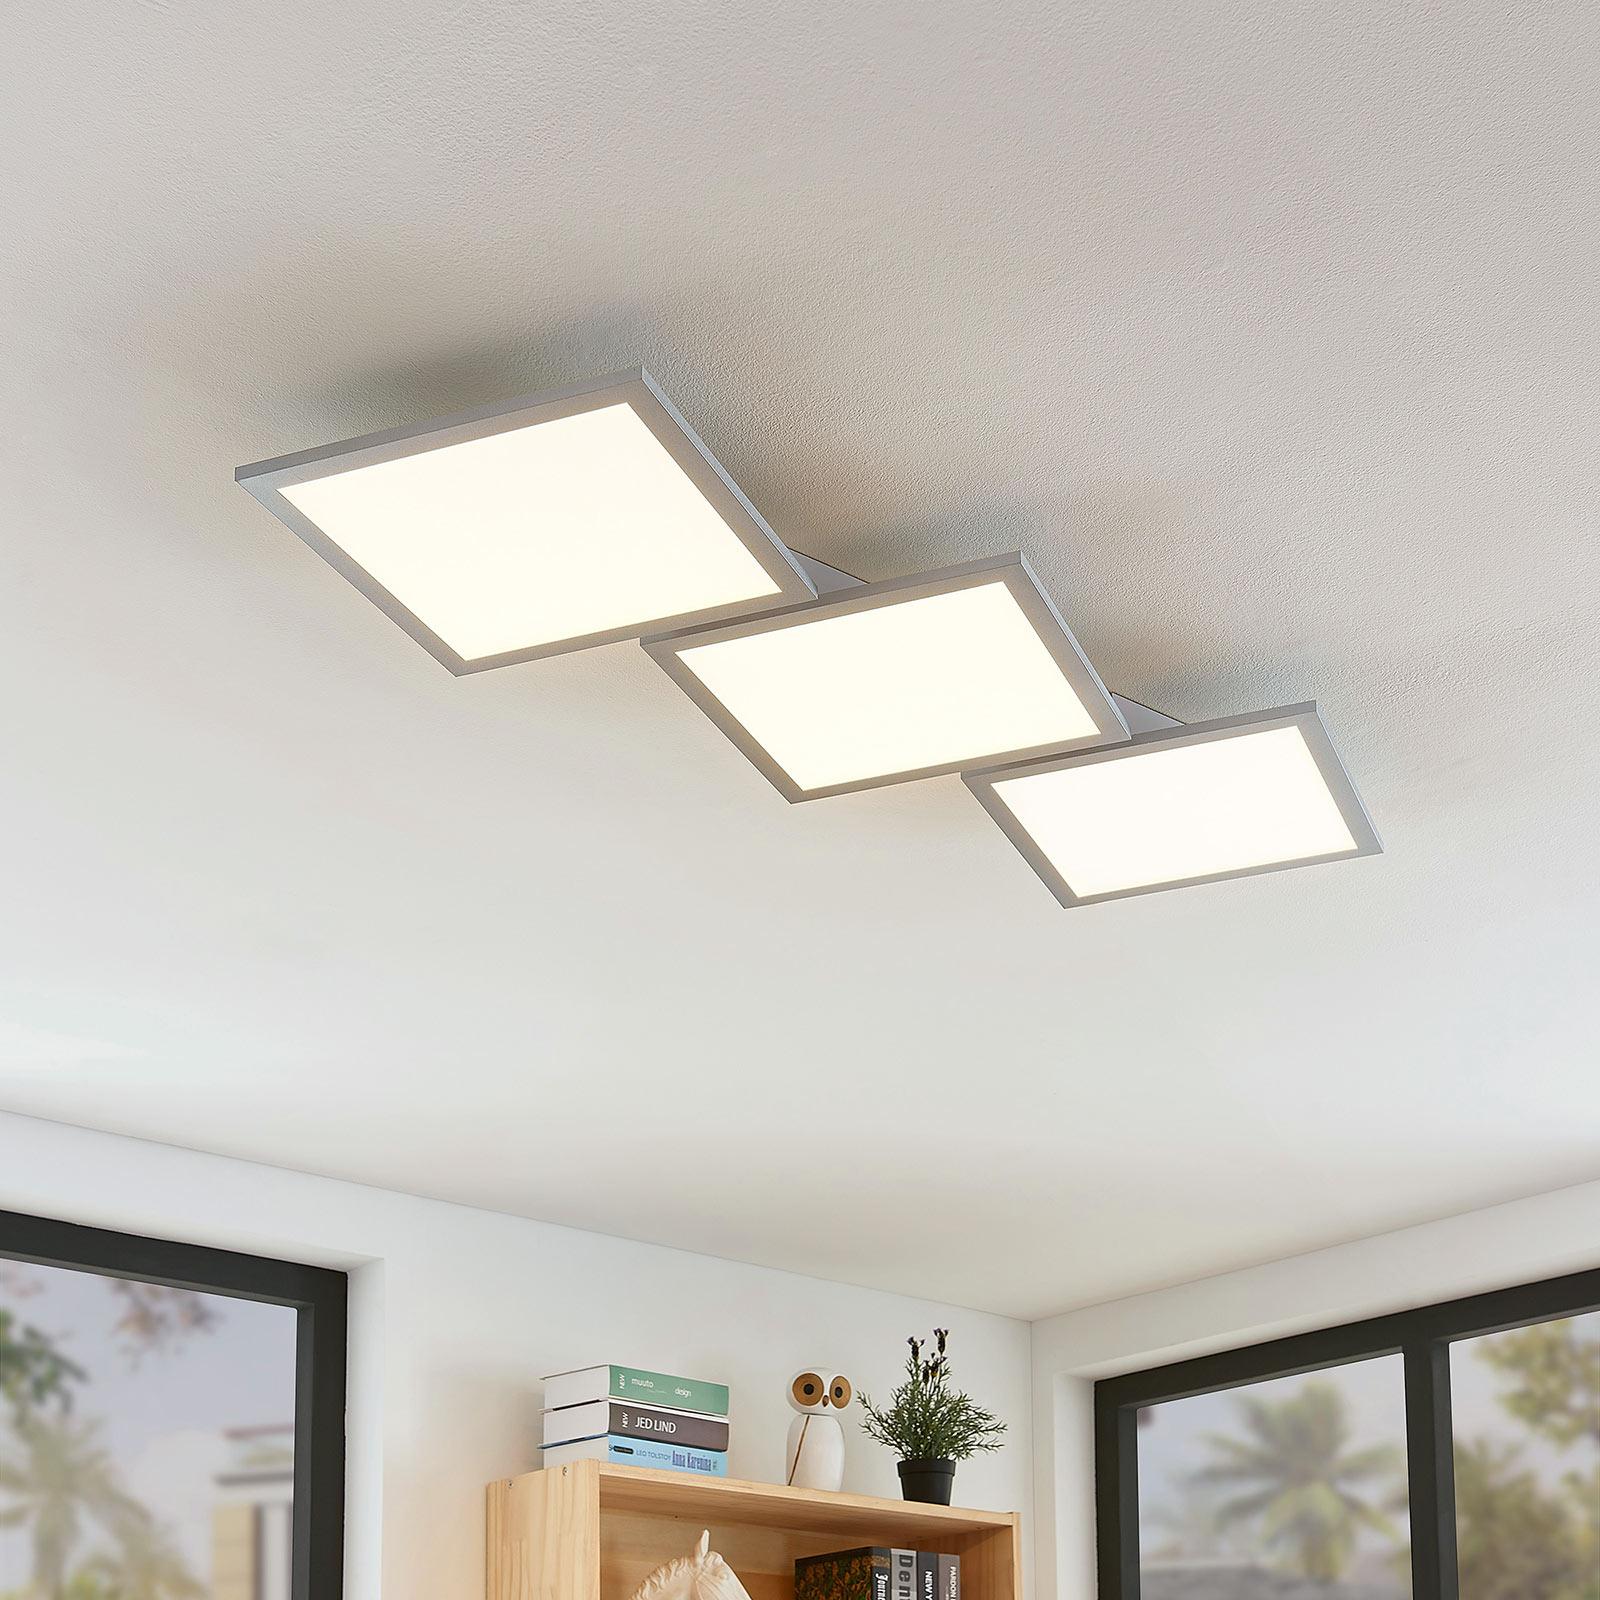 LED Deckenleuchte Ilira, dimmbar, CCT, 3 flammig